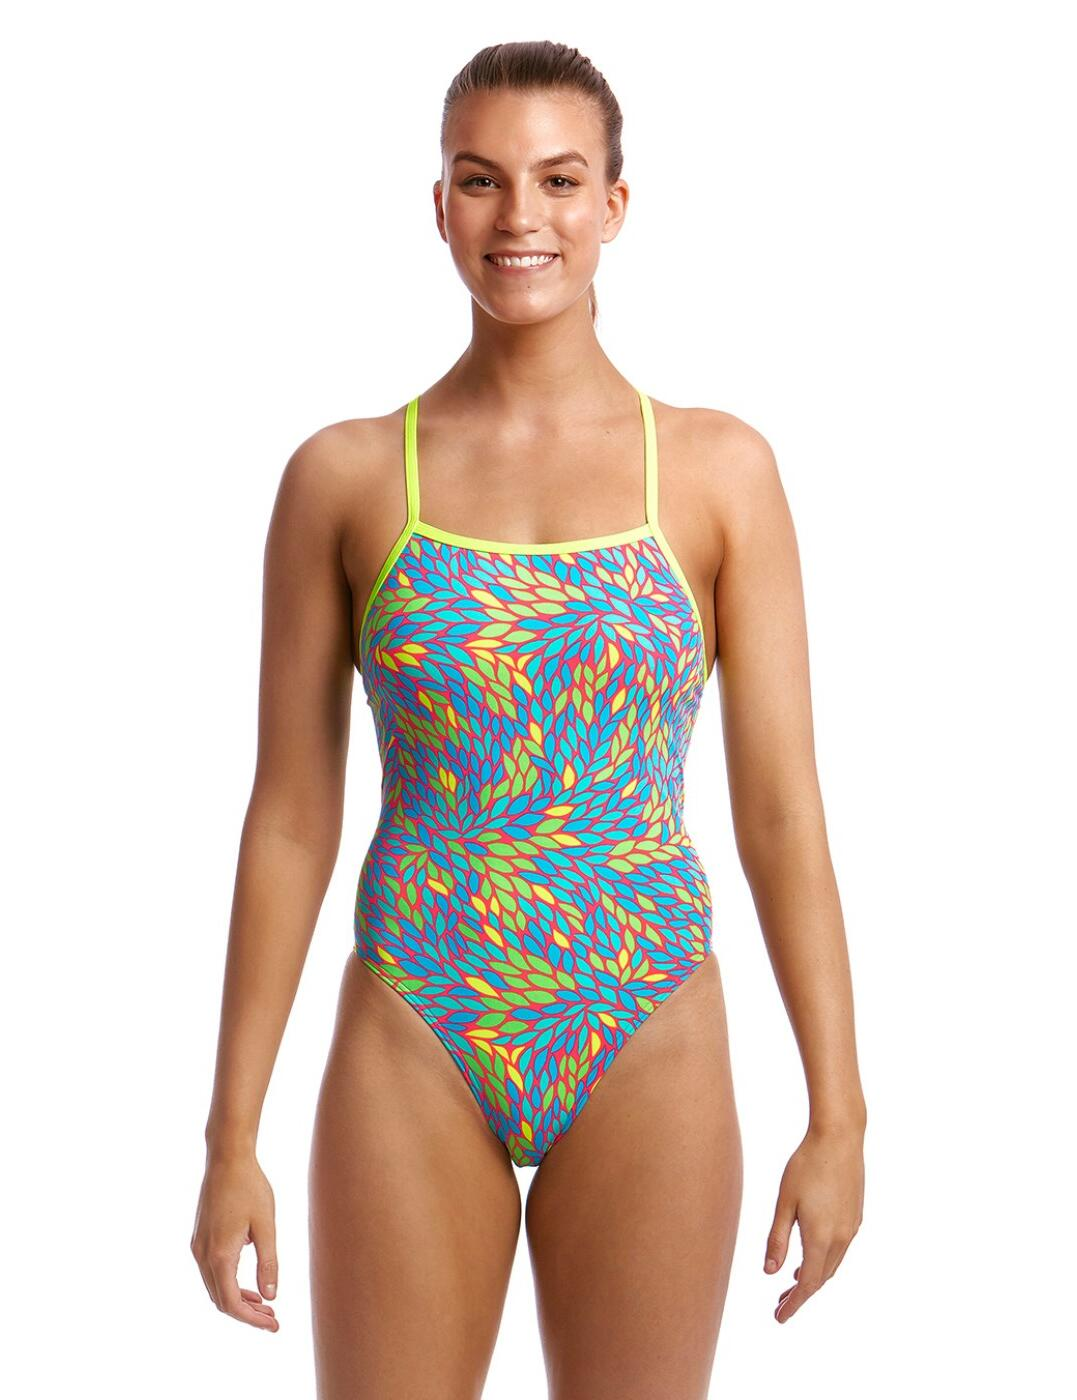 FKS001L Funkita Ladies Tie Me Tight One Piece Swimsuit - FKS001L02321 Leave Me